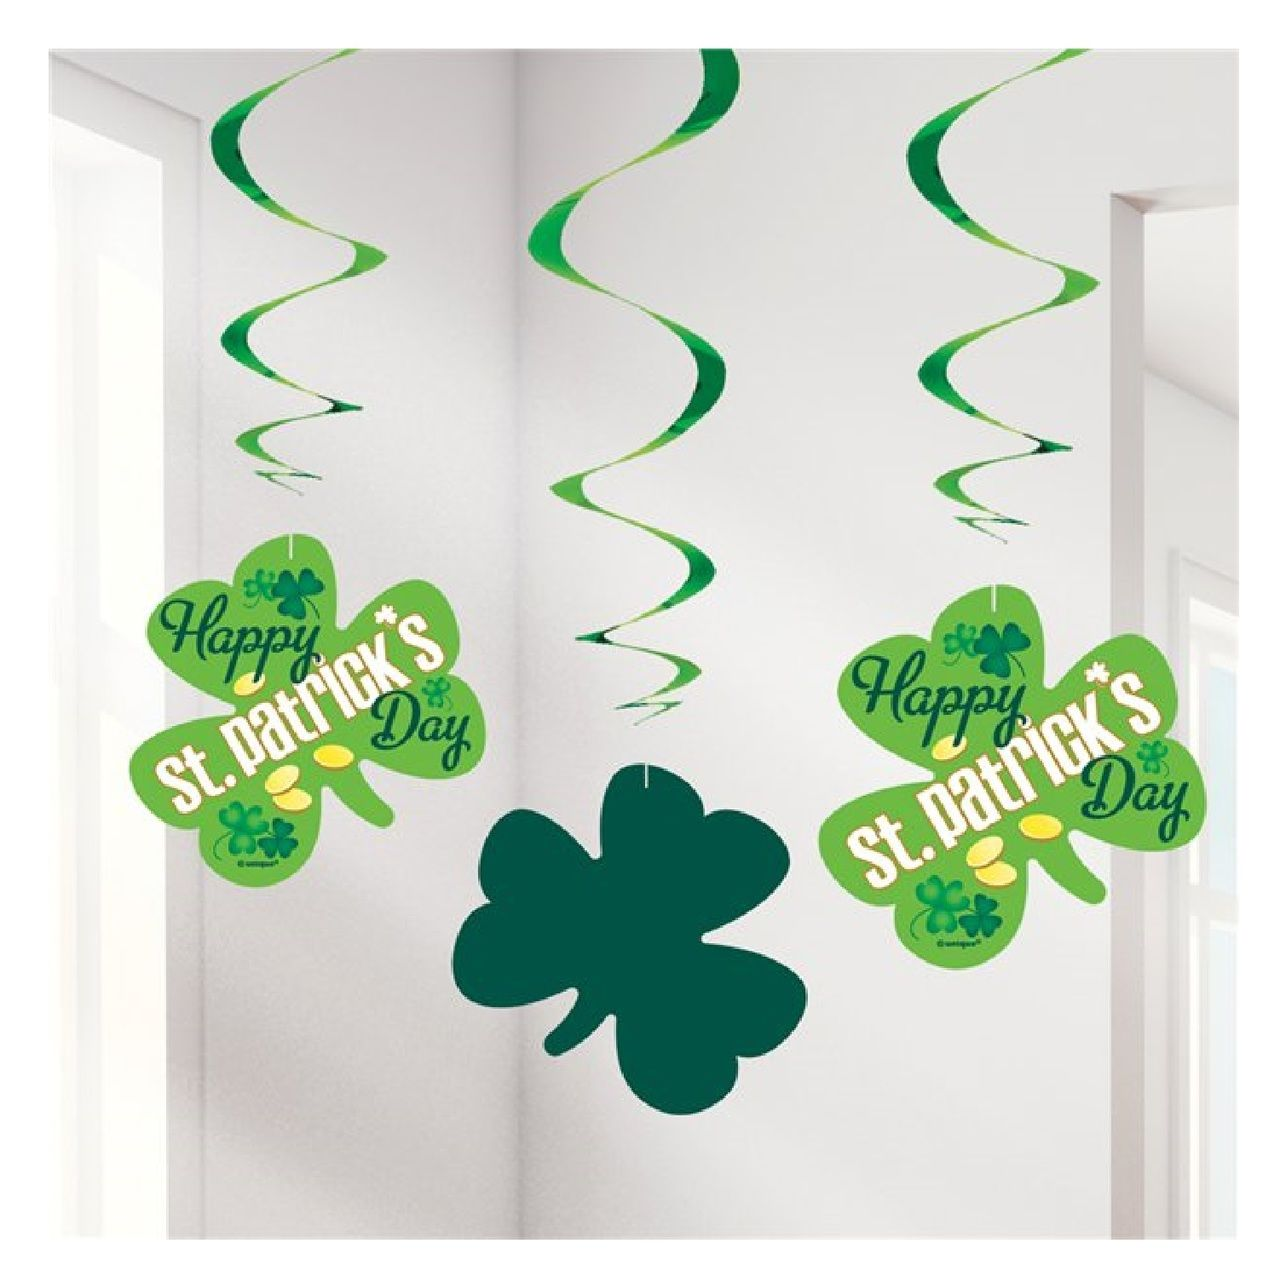 Happy st patricks day shamrock decorations in 2020 irish